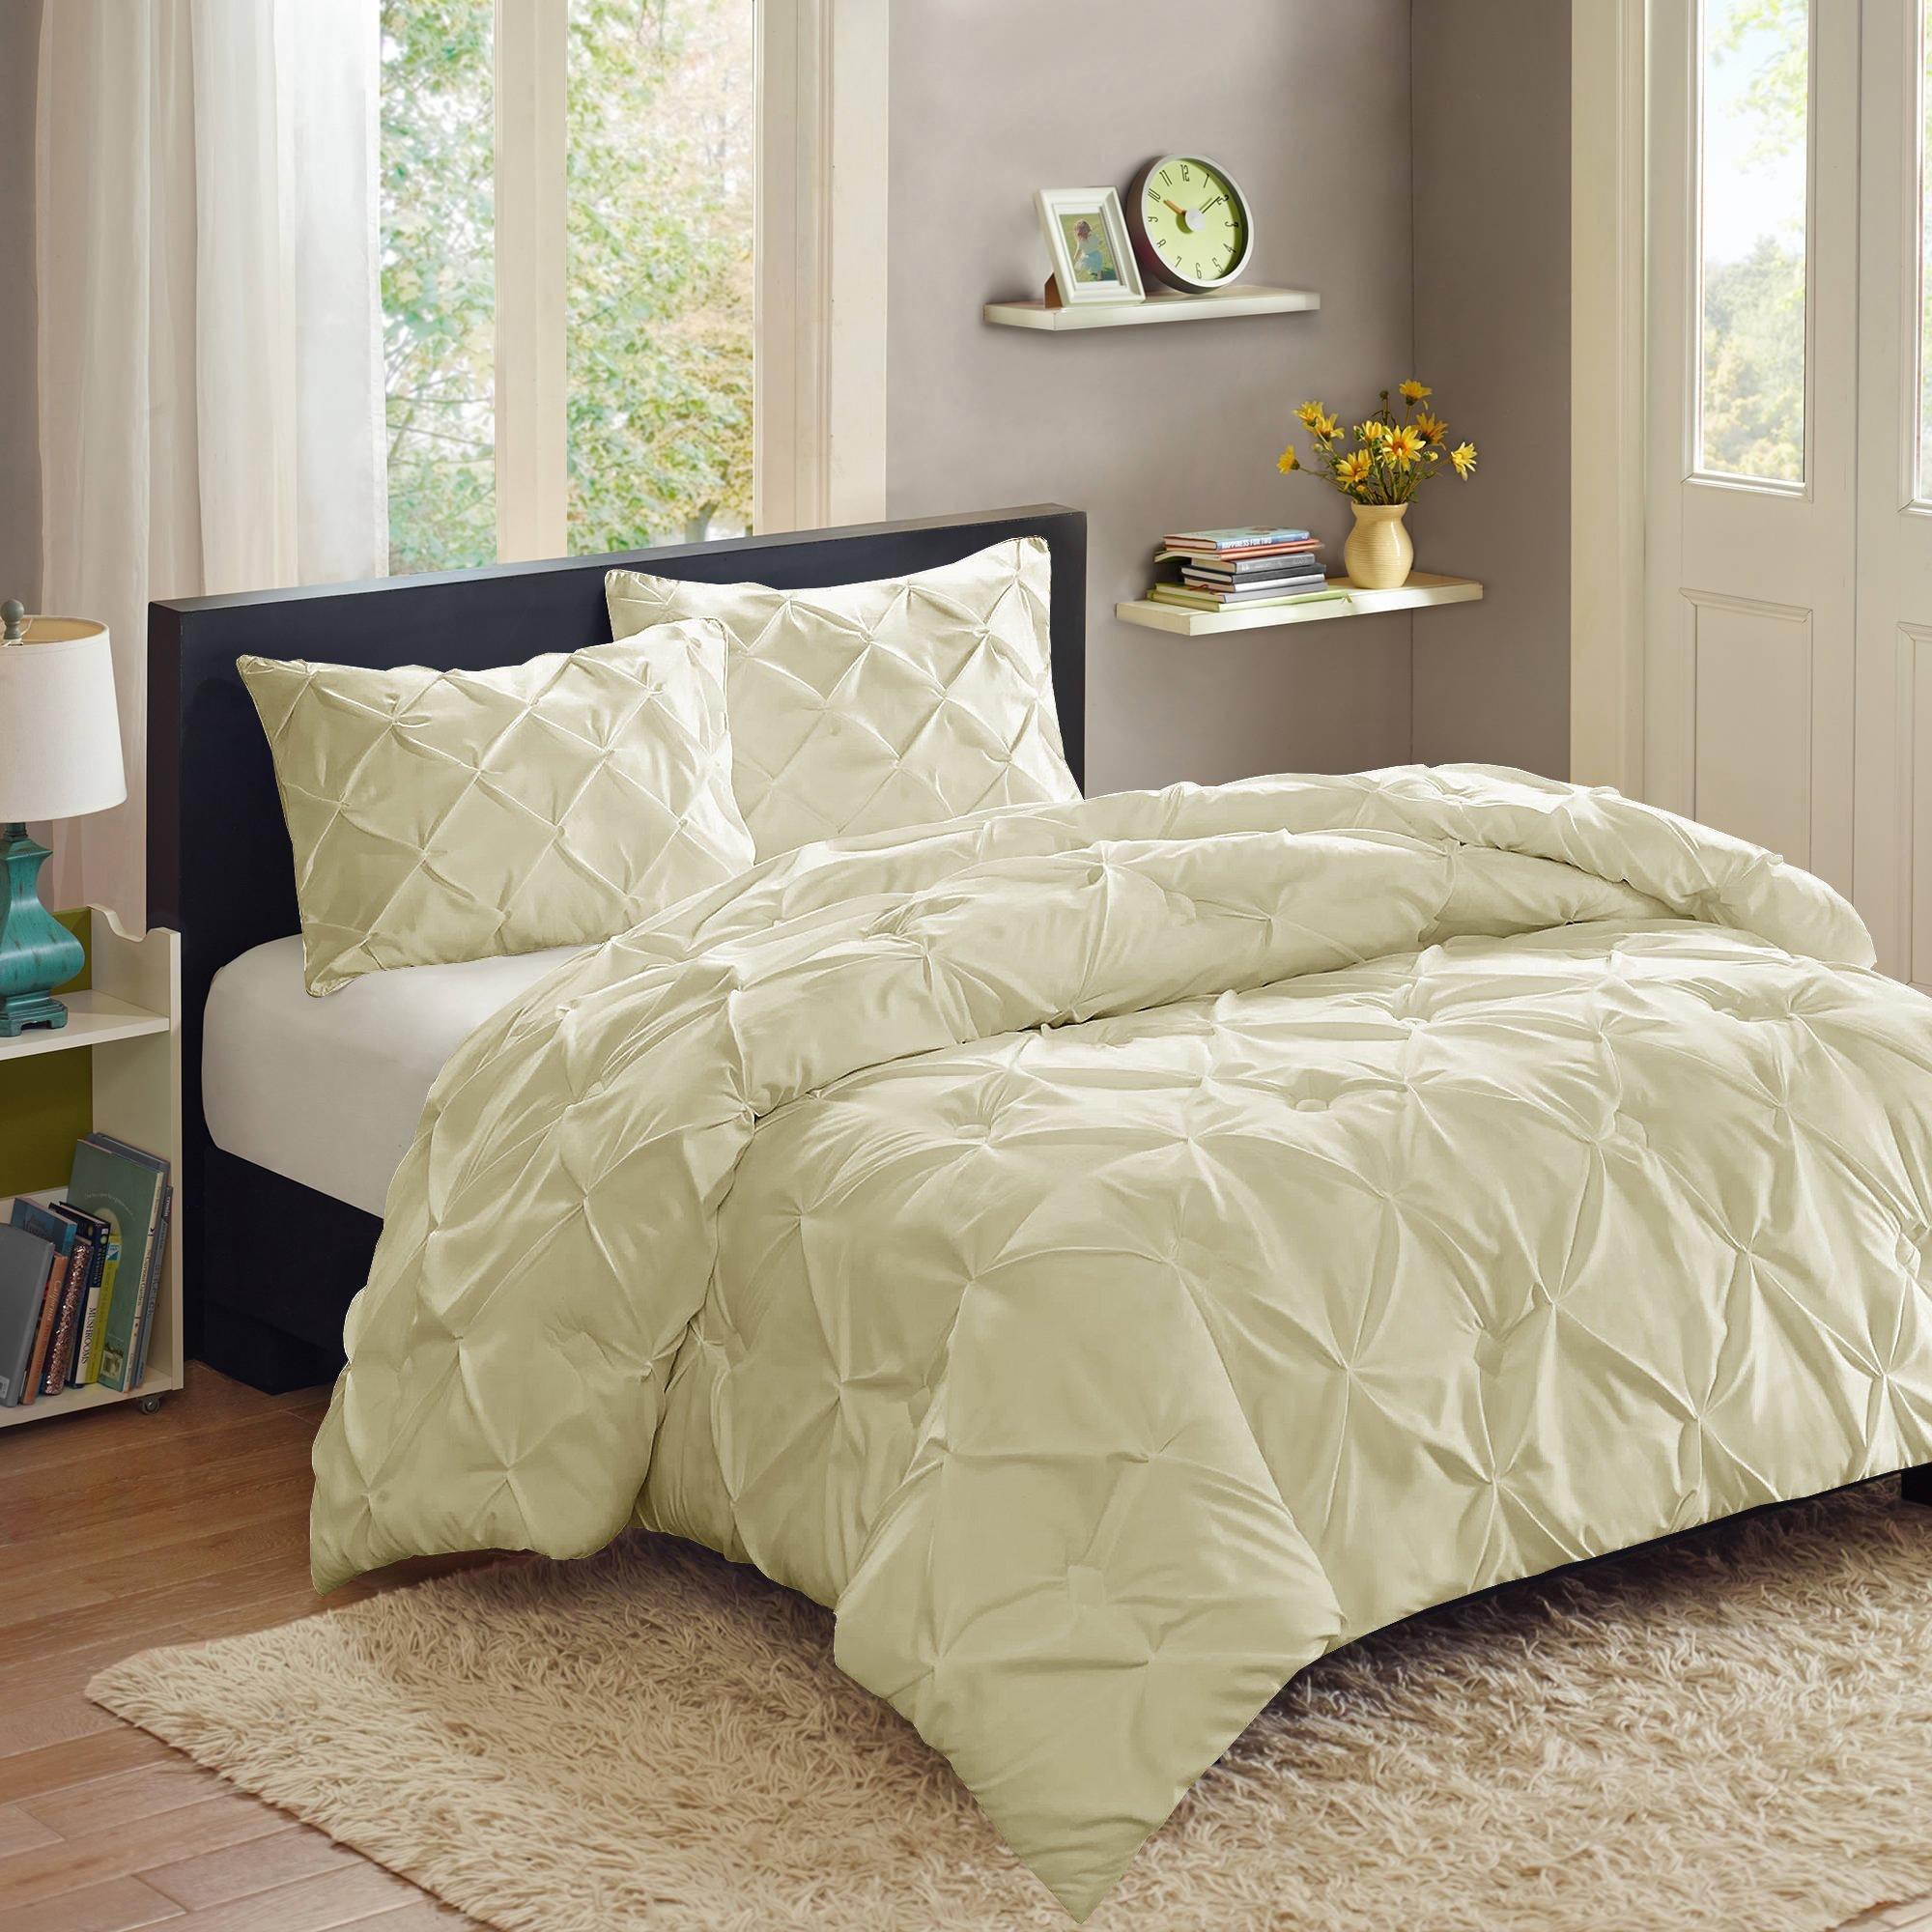 Sweet Home Collection 3 Piece Luxury Pinch Pleat Pintuck Fashion Duvet Set, King, Beige